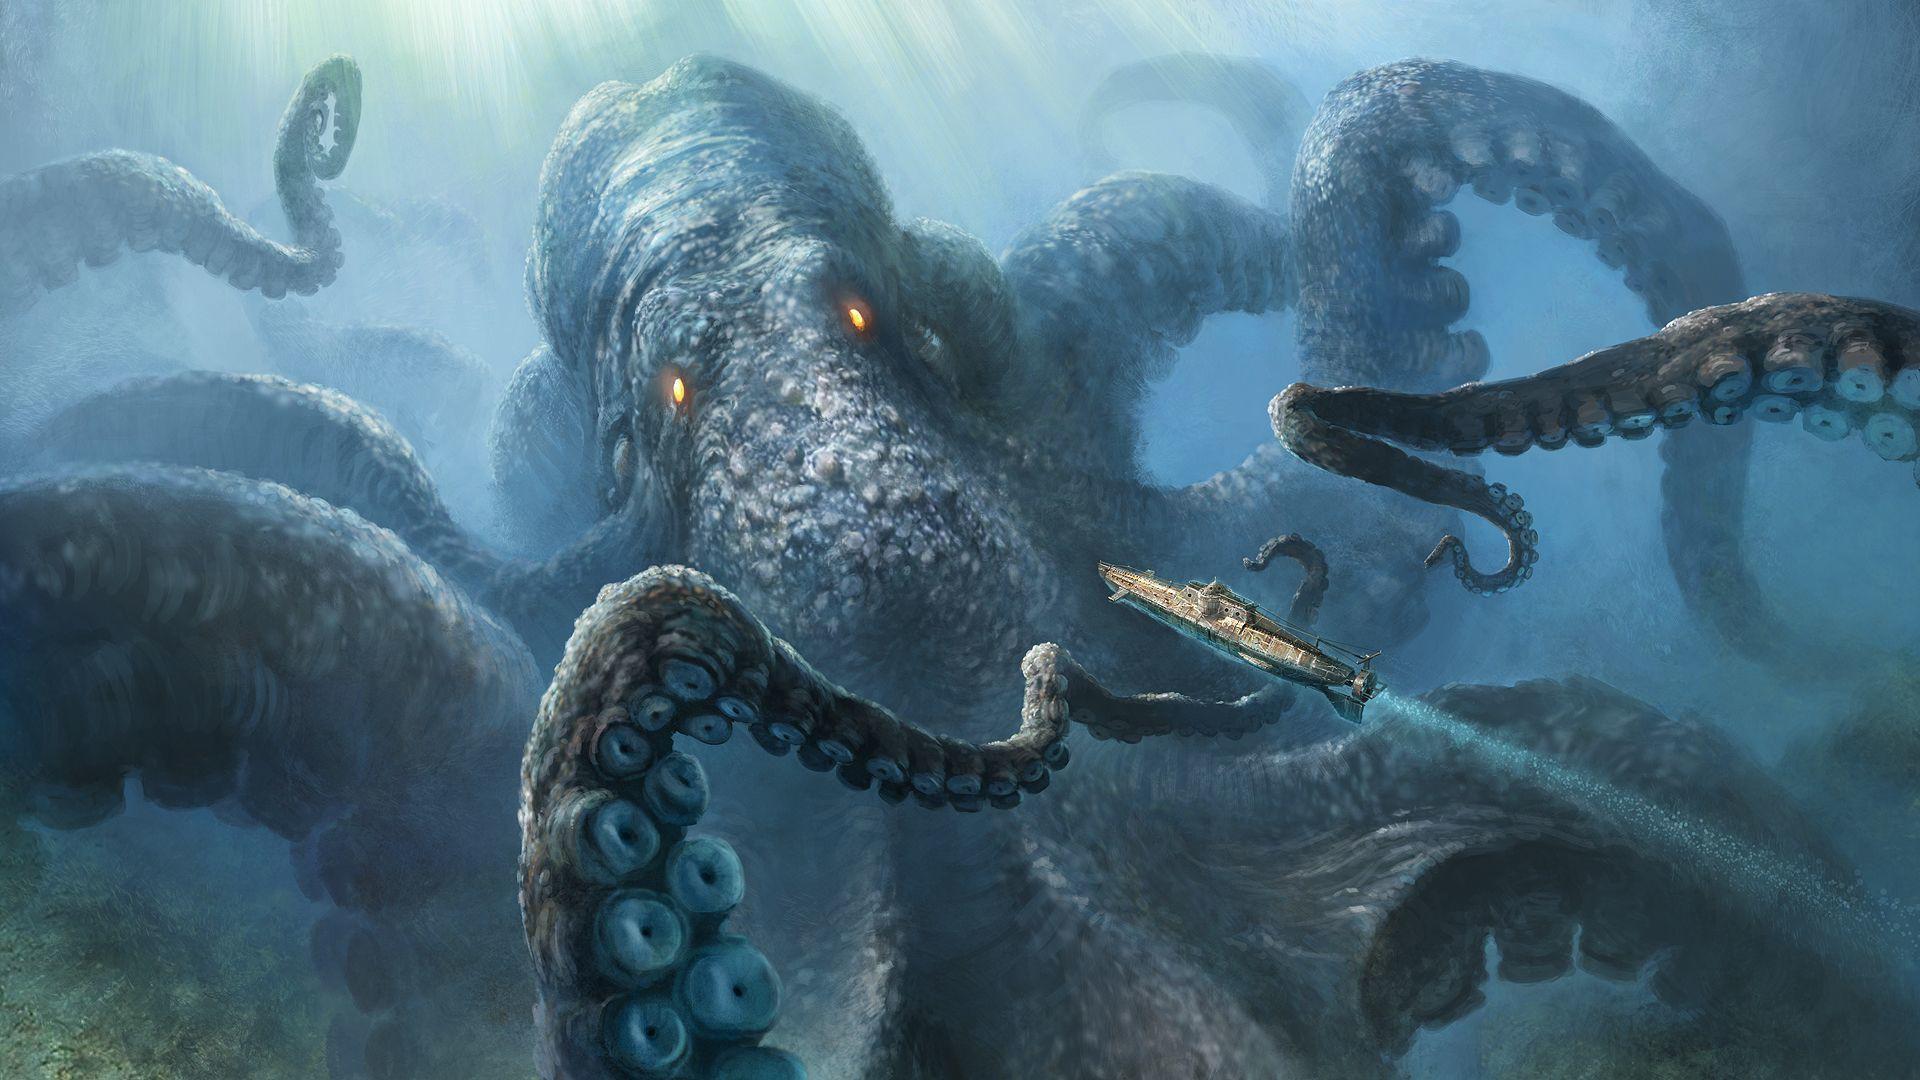 Кракен - спящий кошмар морских глубин